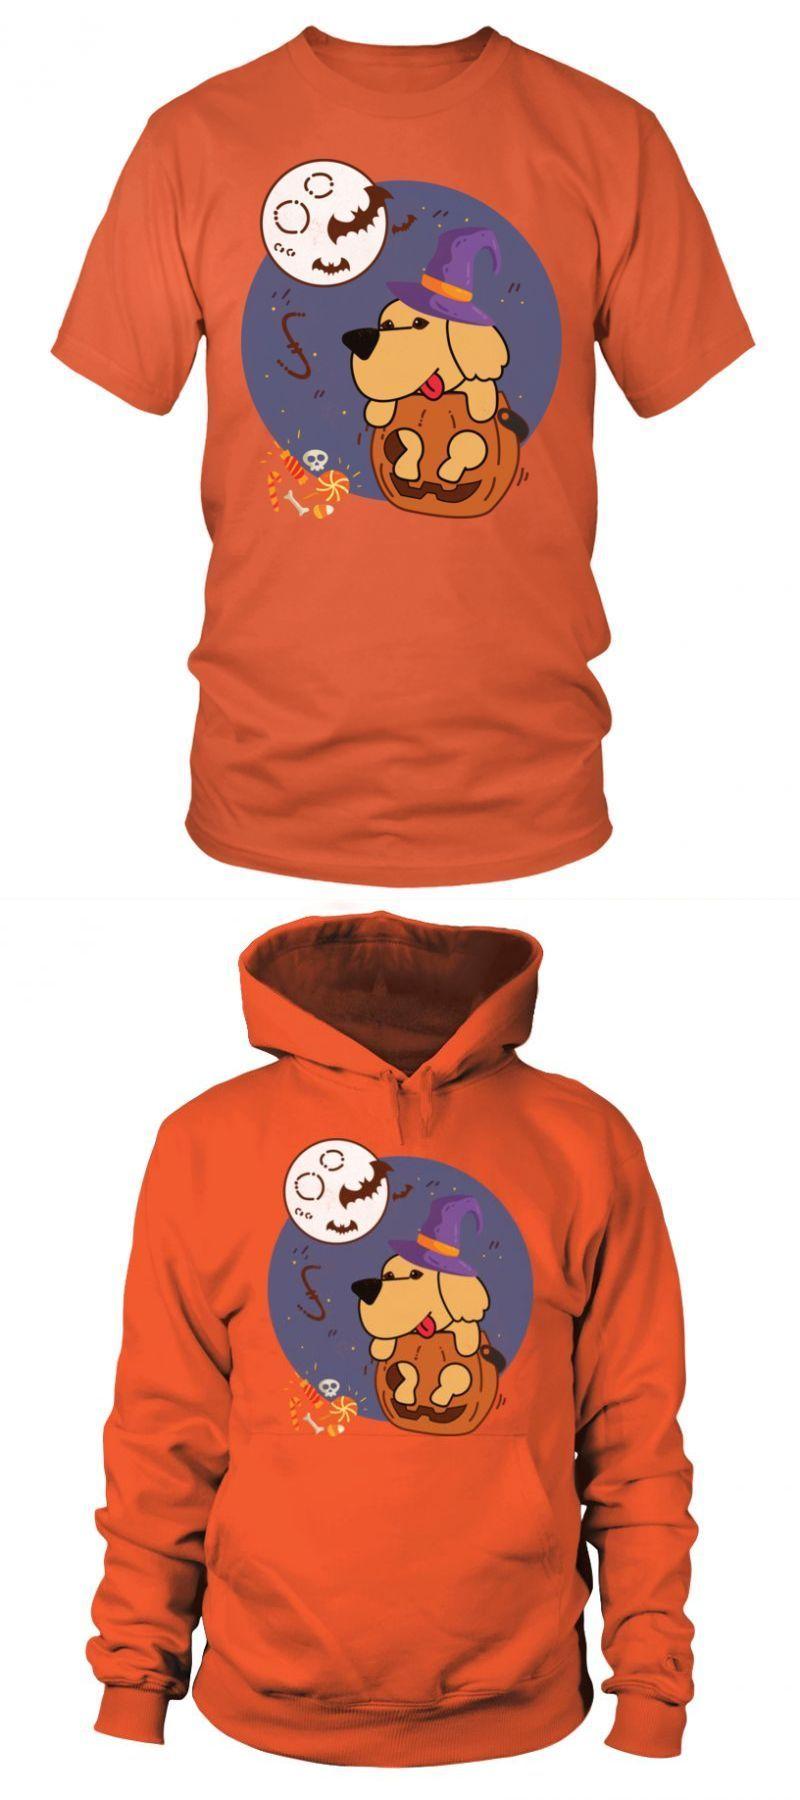 7c89bb81 Mardi gras t-shirts dog retrievers golden dog halloween mardi gras t shirts  target #mardi #gras #t-shirts #dog #retrievers #golden #halloween #shirts  ...